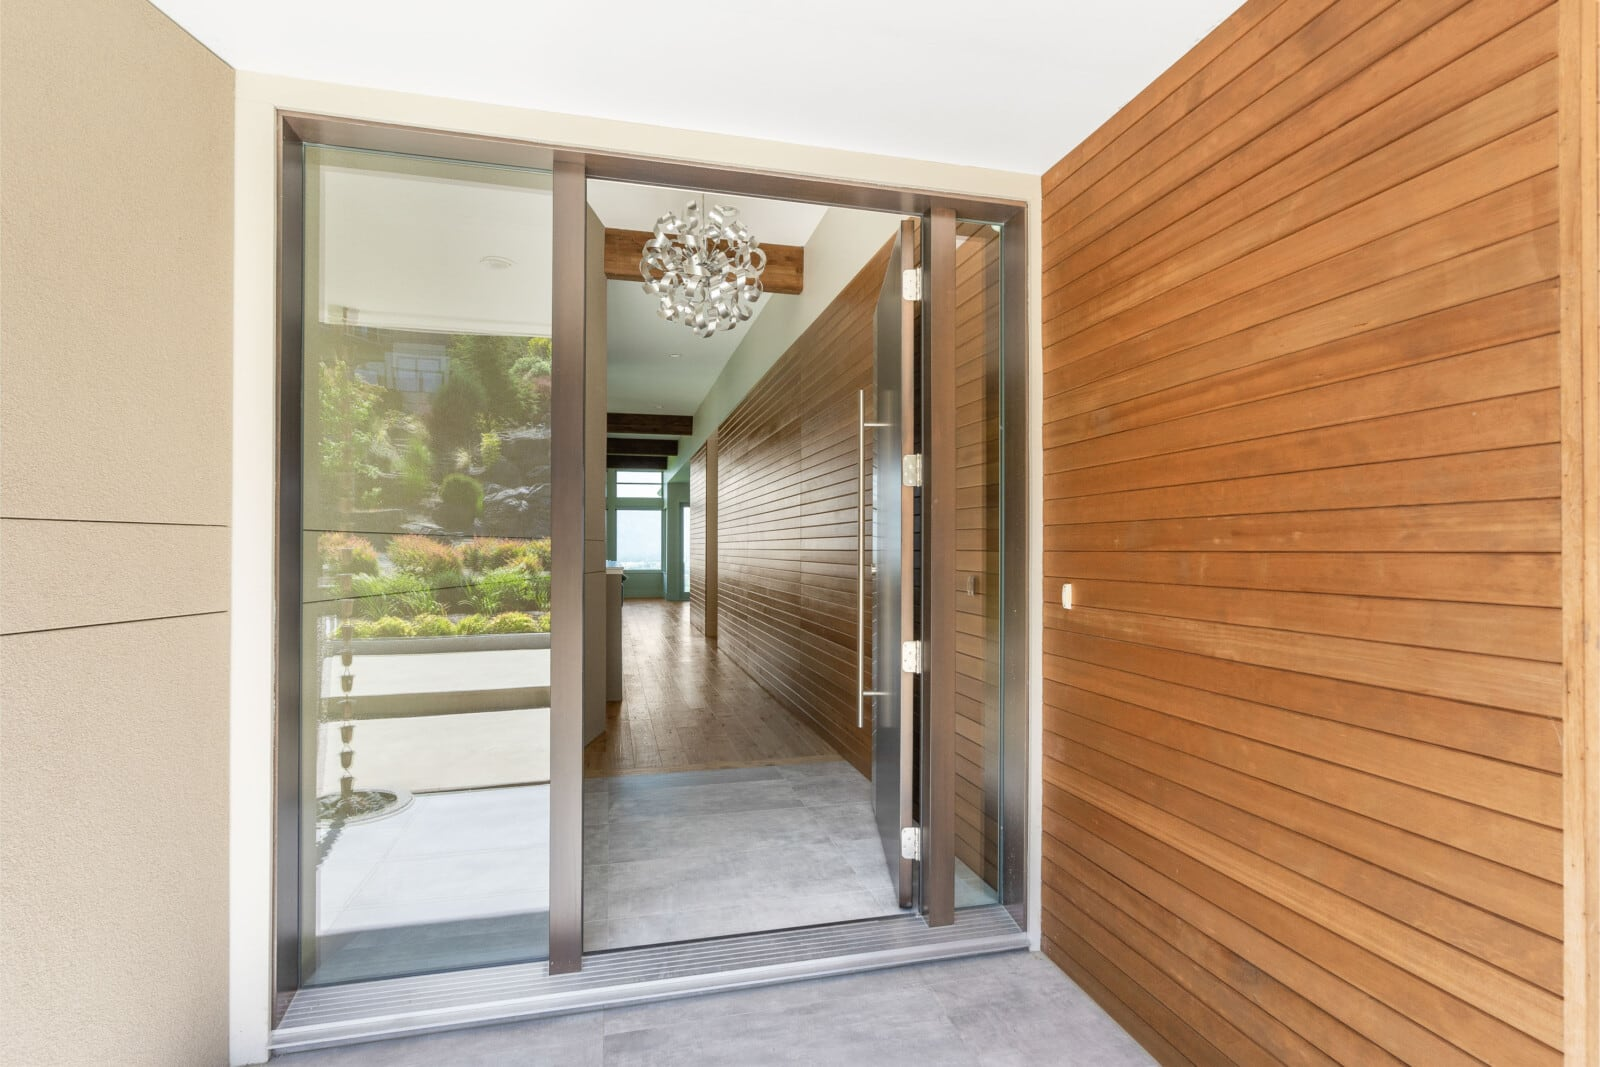 Custom entryway construction